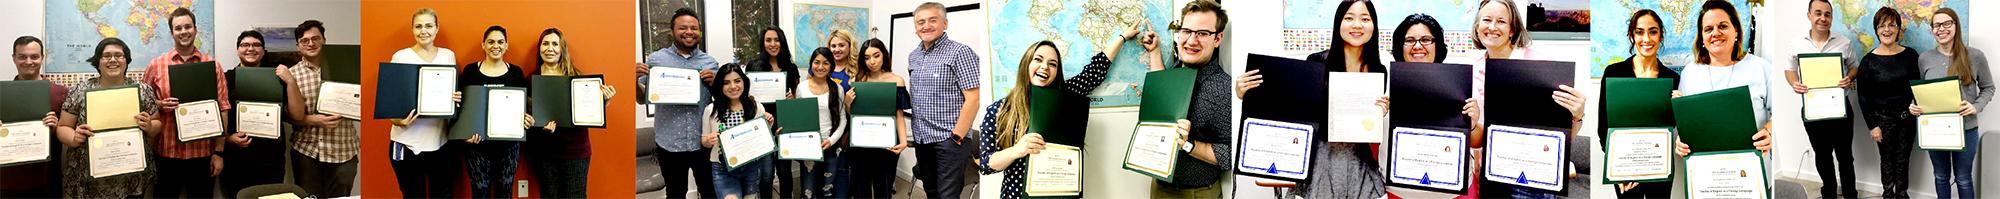 AZ Language Graduates Stitch